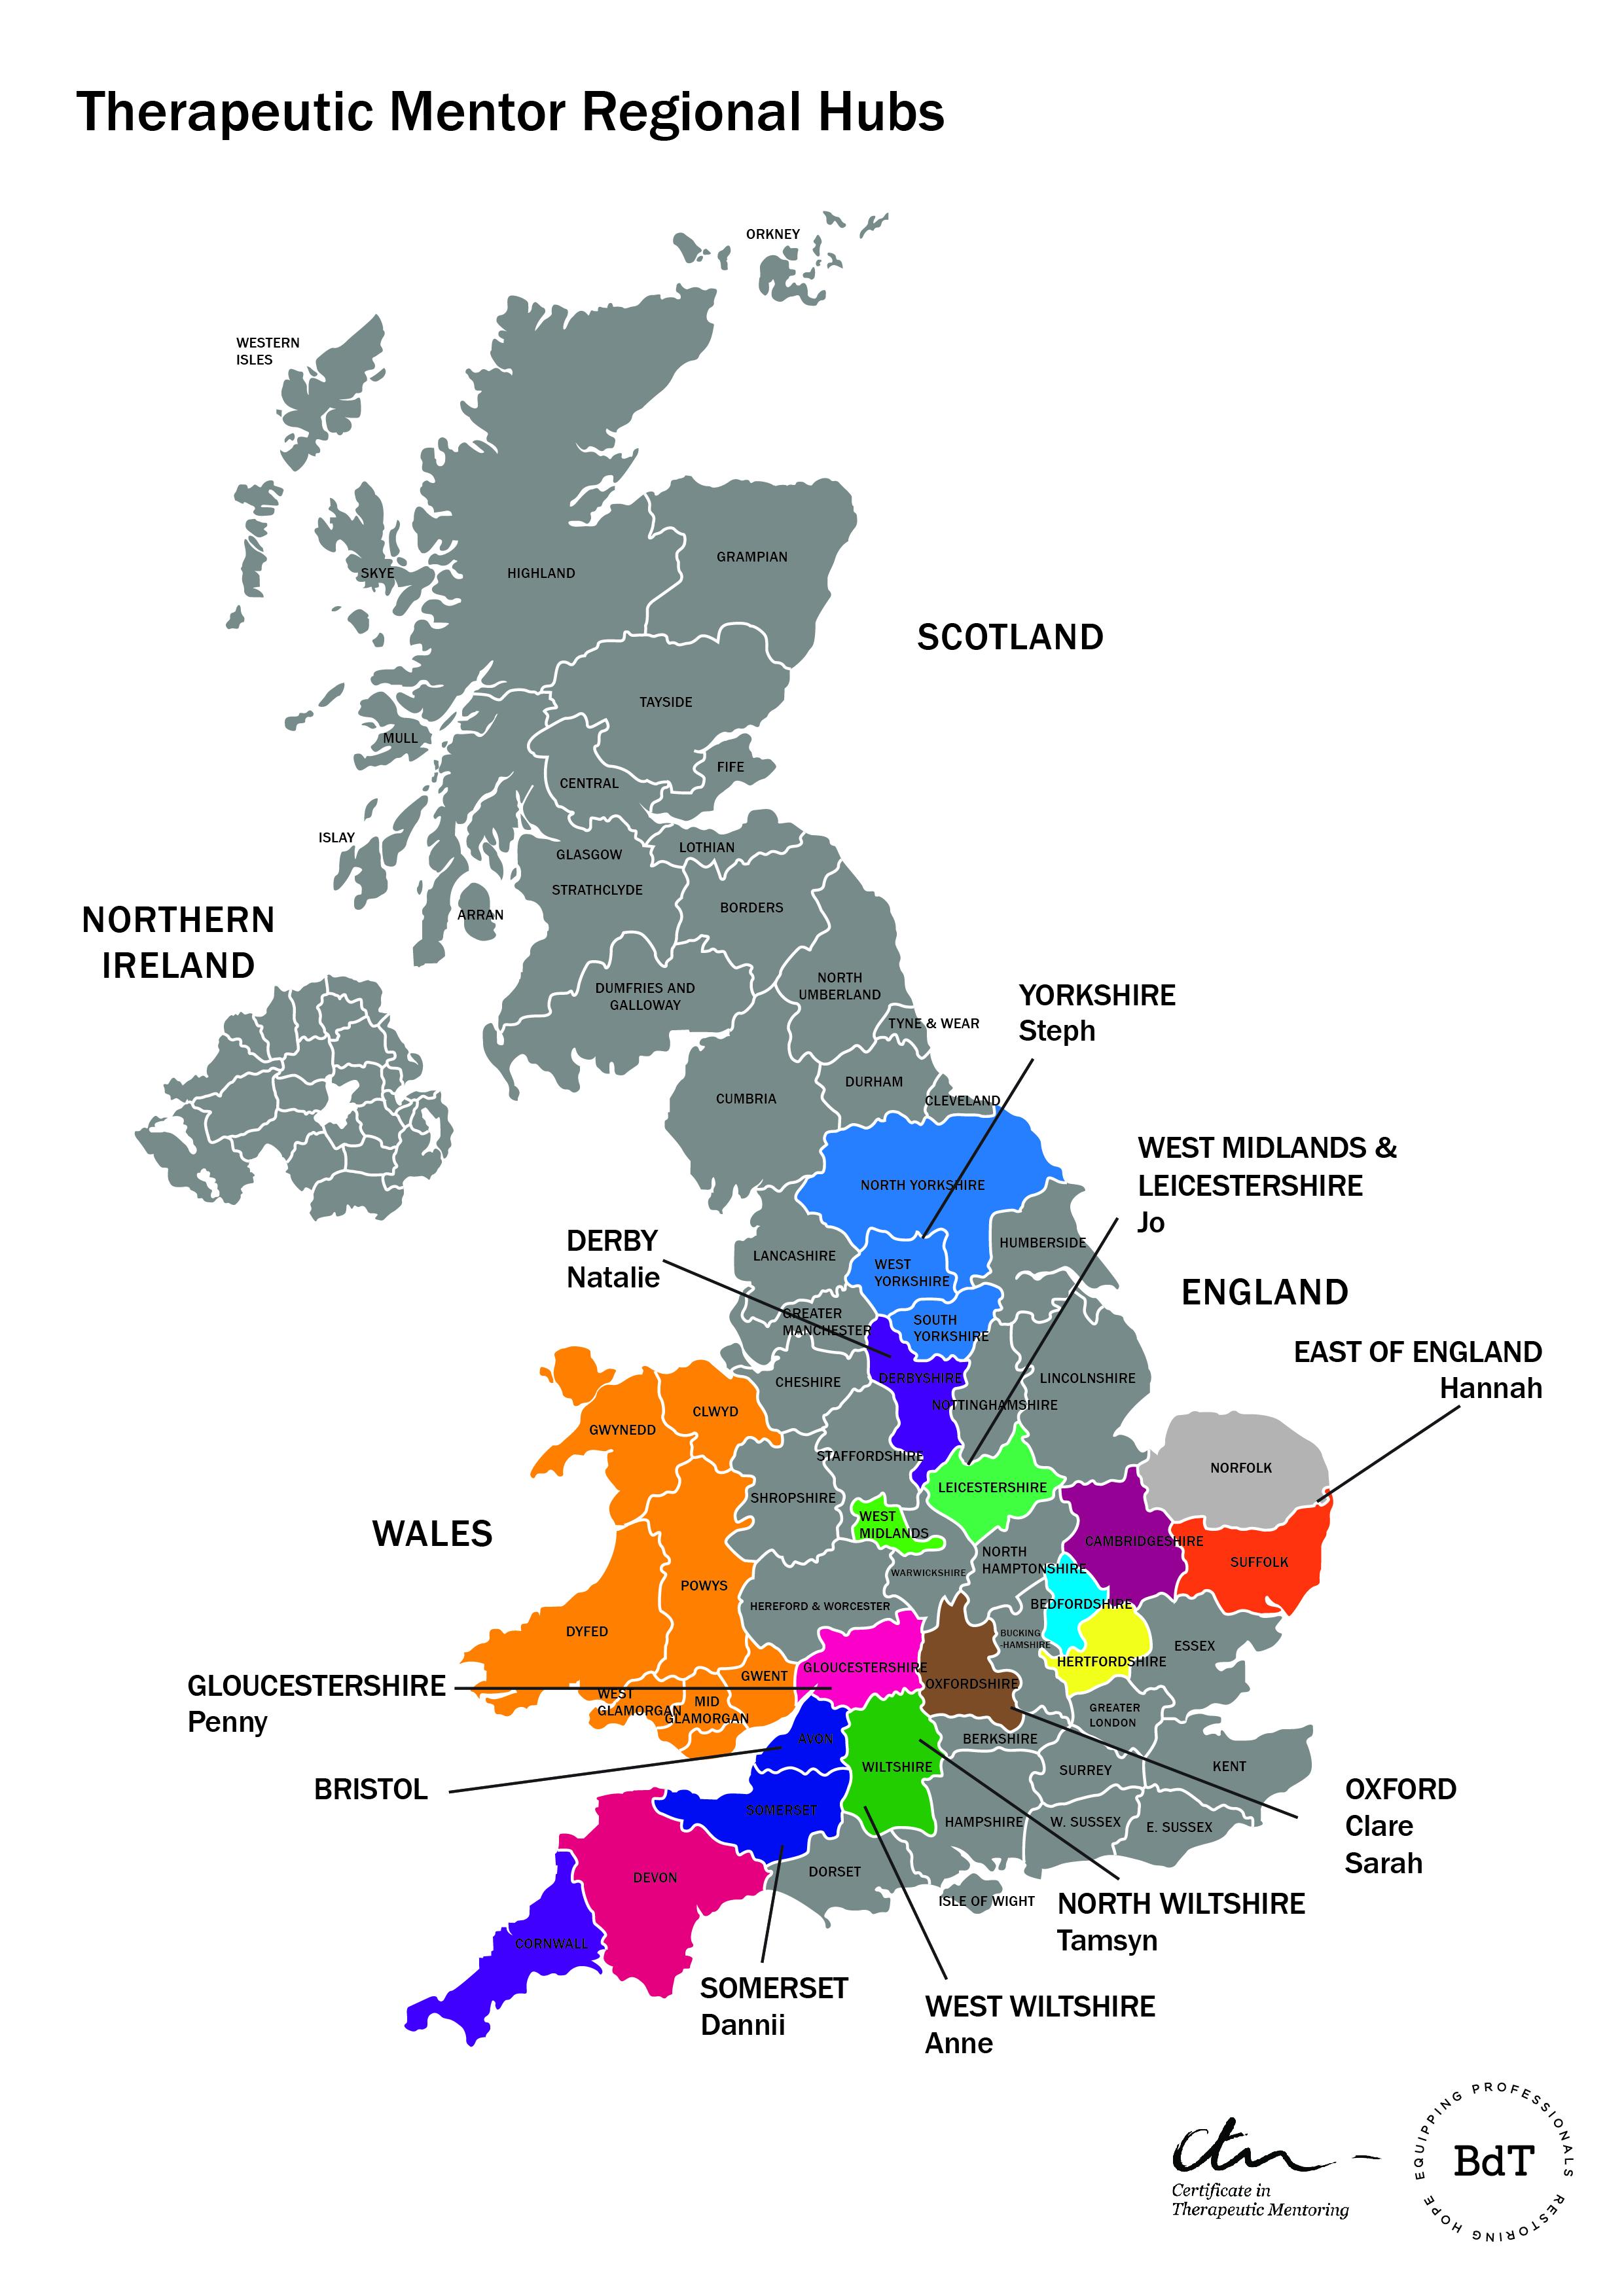 therapeutic_mentor_regional_hubs_map2.jpg